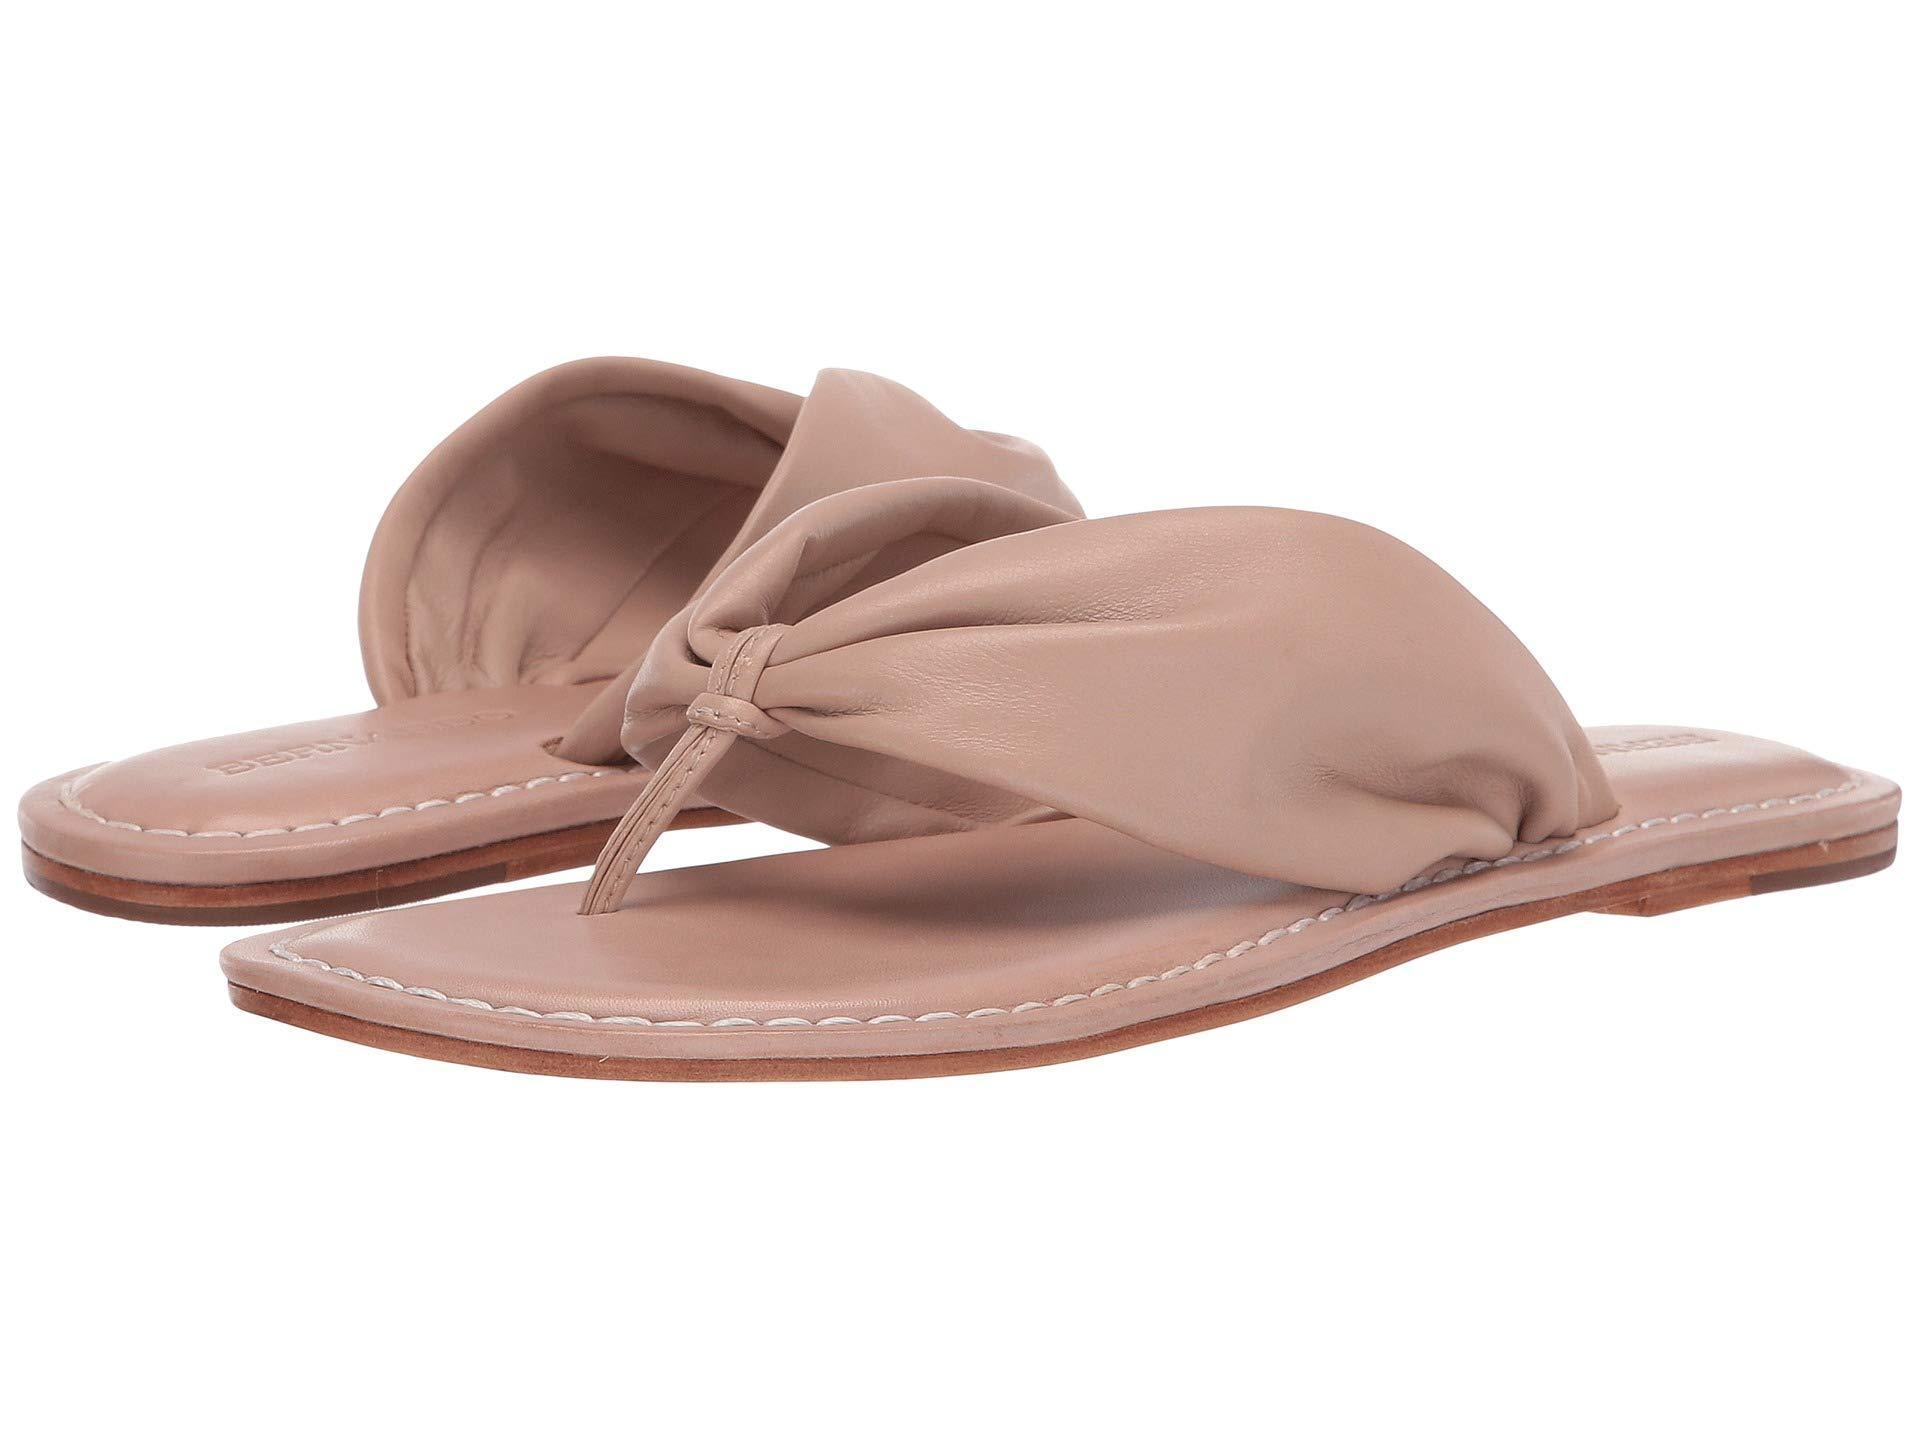 8ce27c34ce0 Lyst - Bernardo Mila Sandal (black Glove) Women s Sandals in Pink